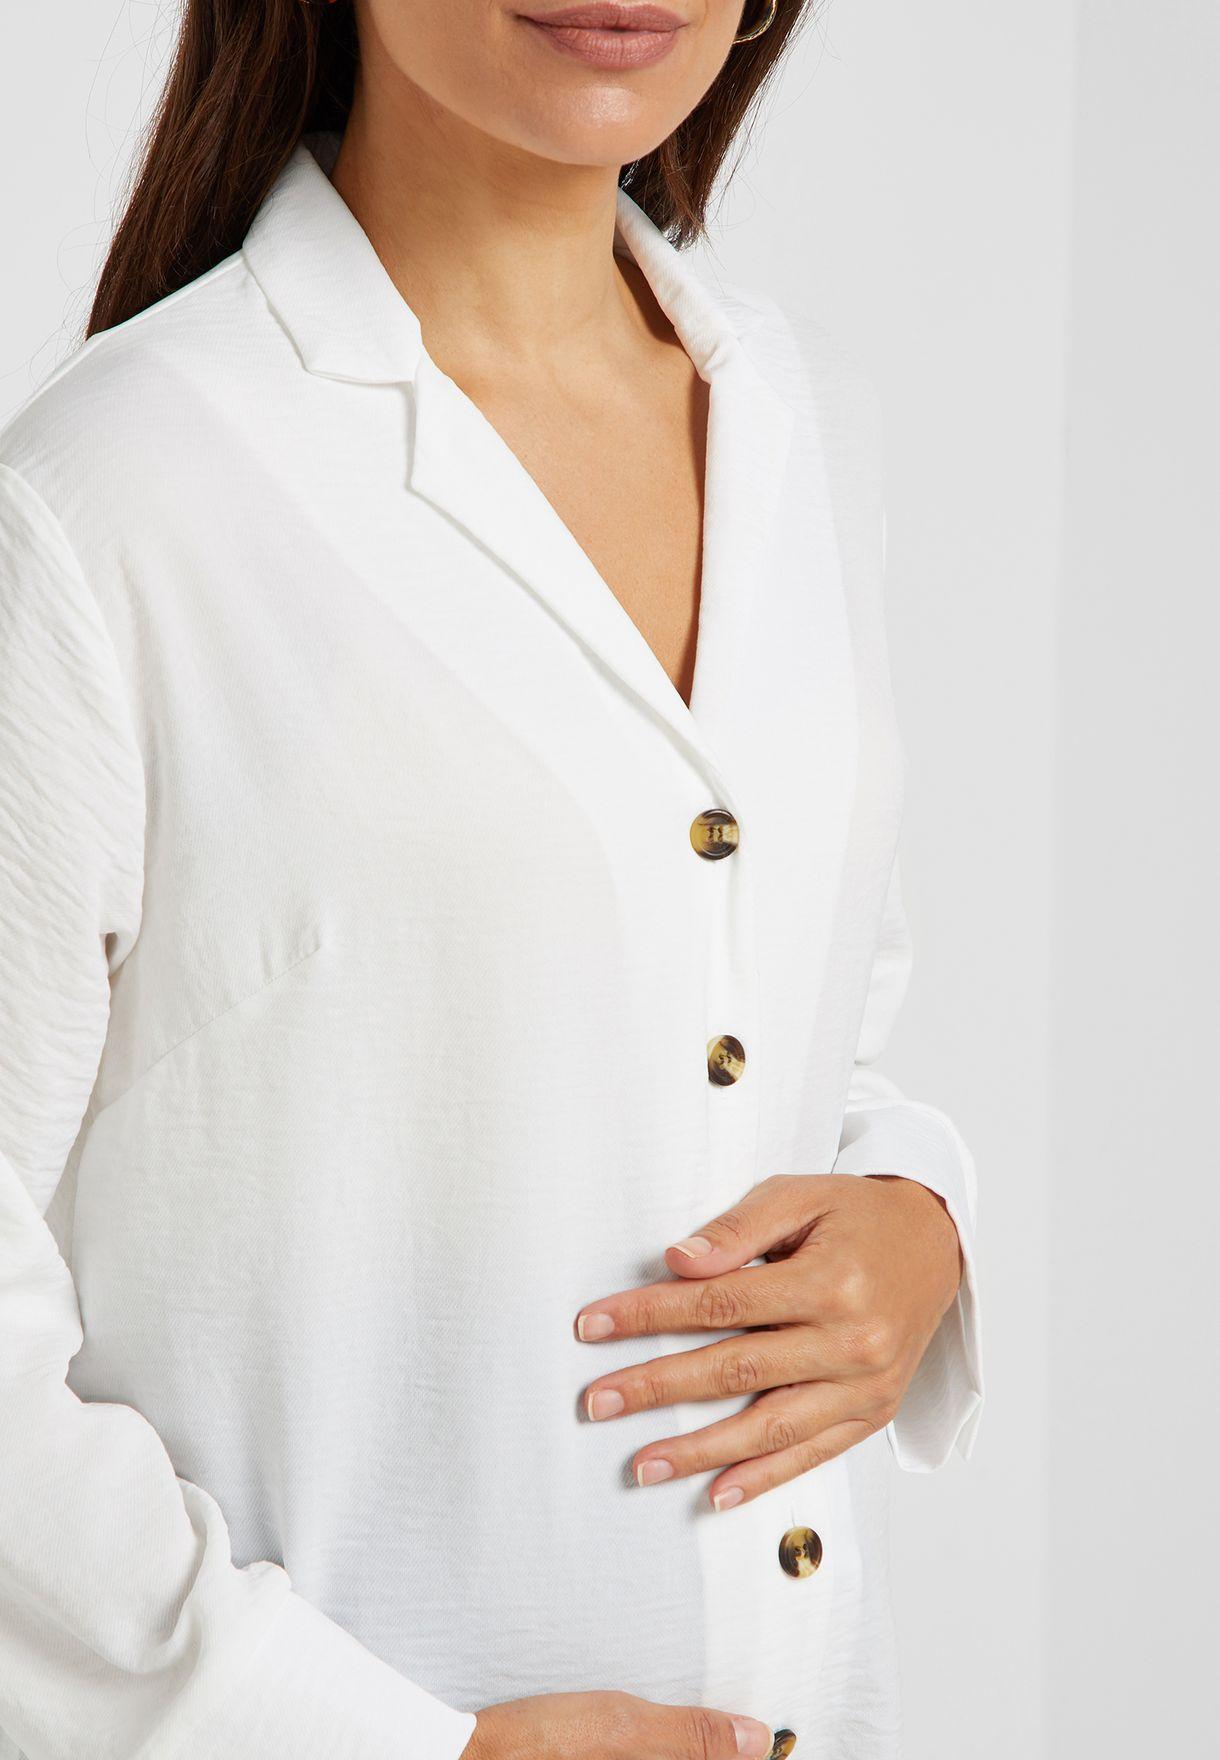 Floral Print Revere Collar Shirt